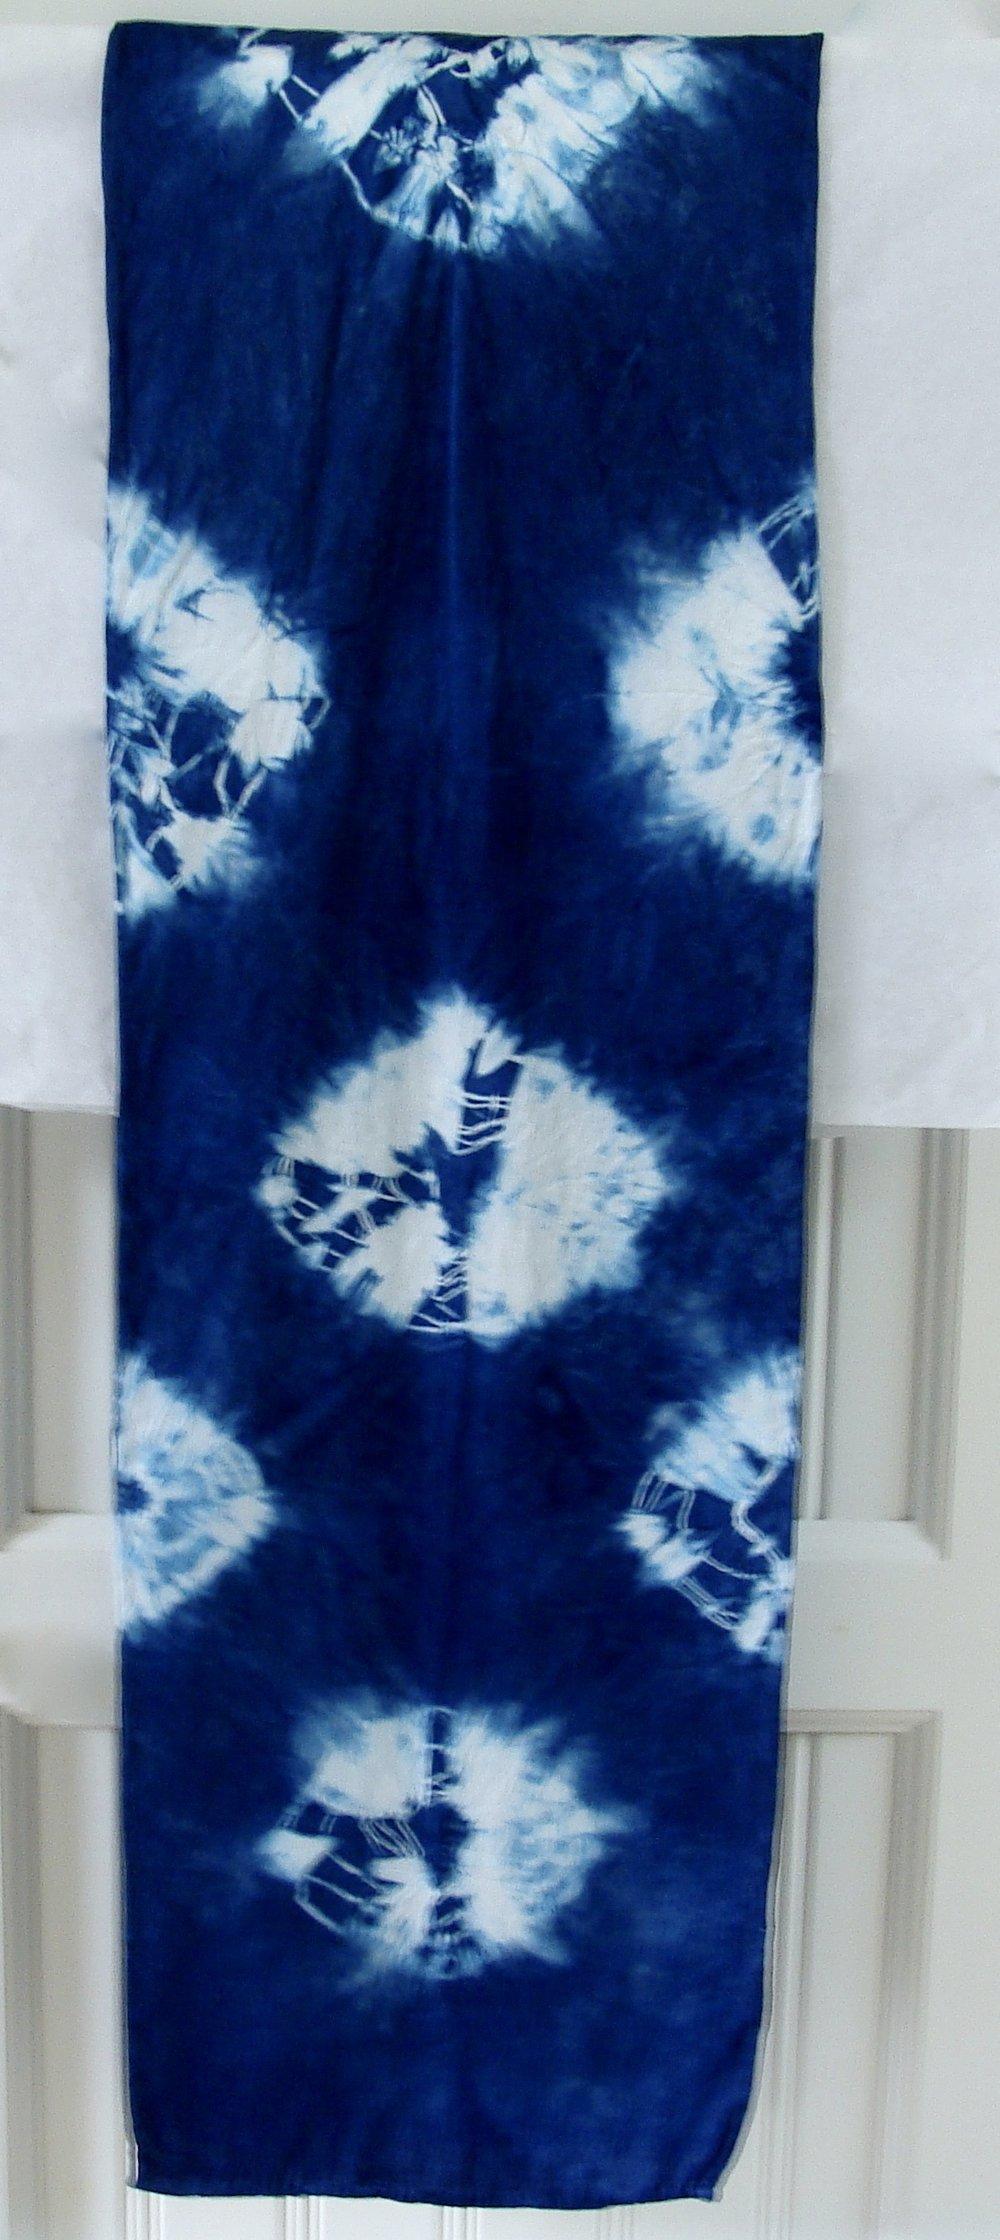 Kumo Shibori - Hand Dyed Charmeuse Silk Scarf